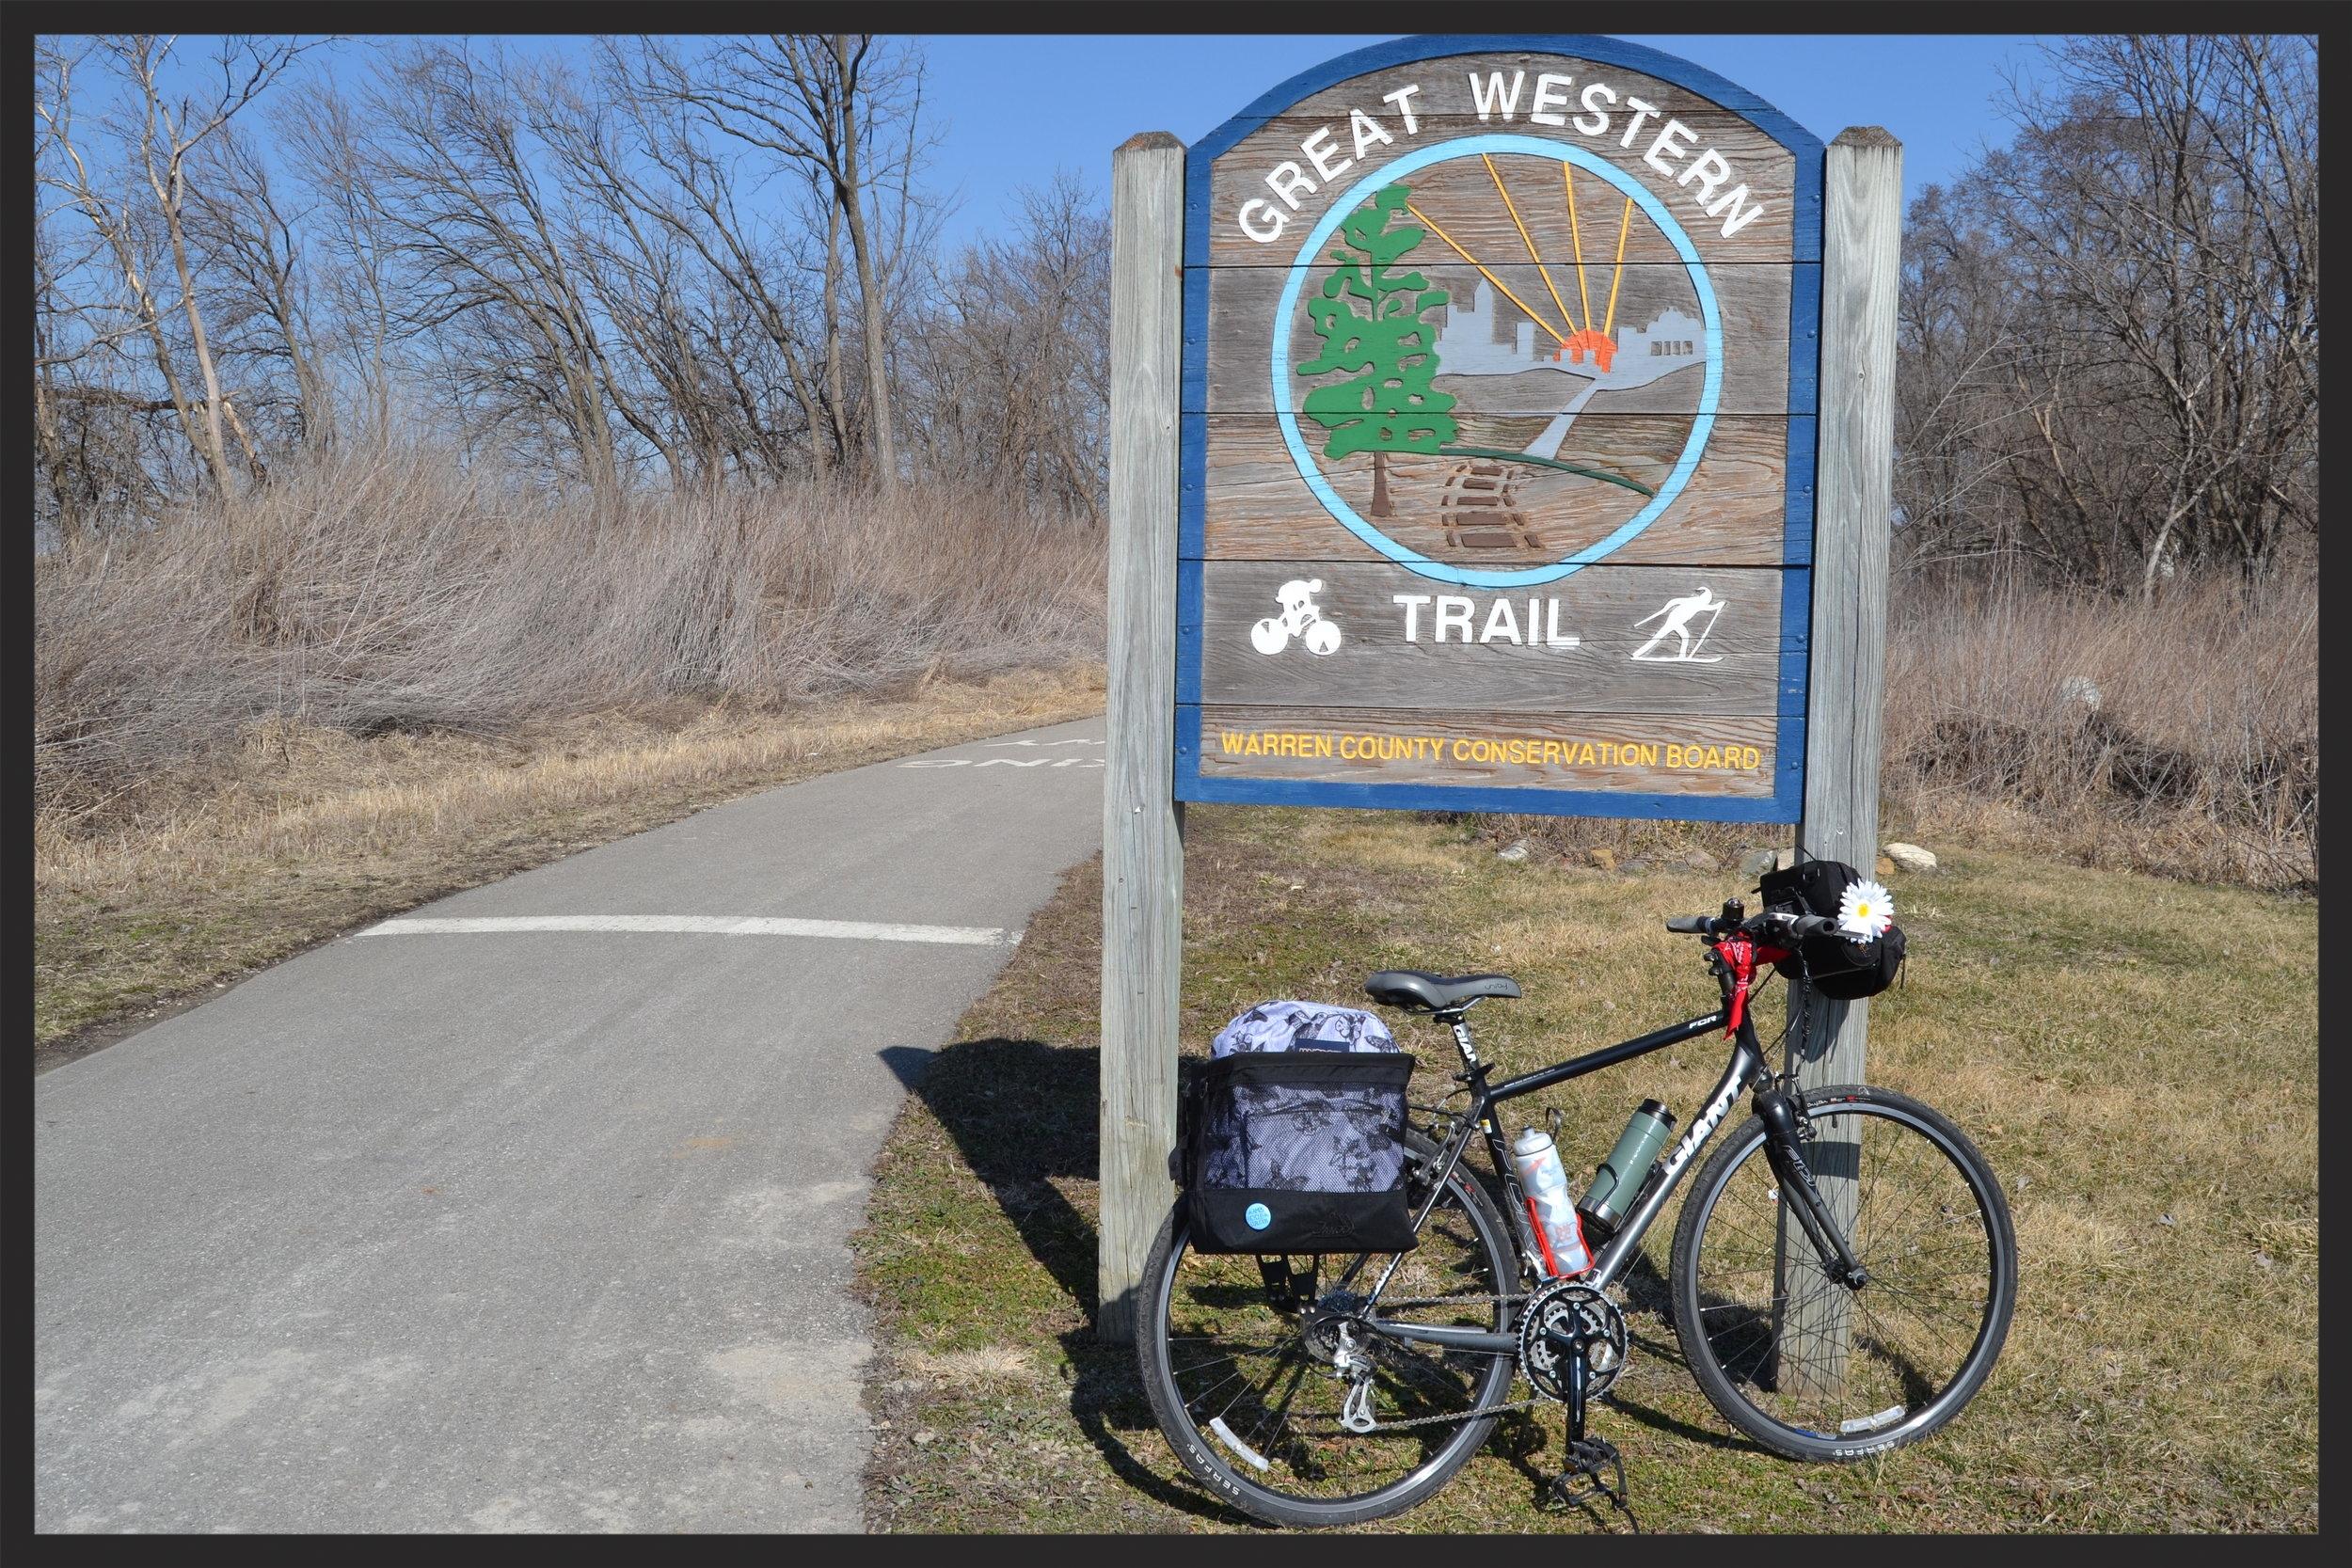 Iowa-Bike-Rides-Great-Western-Trail